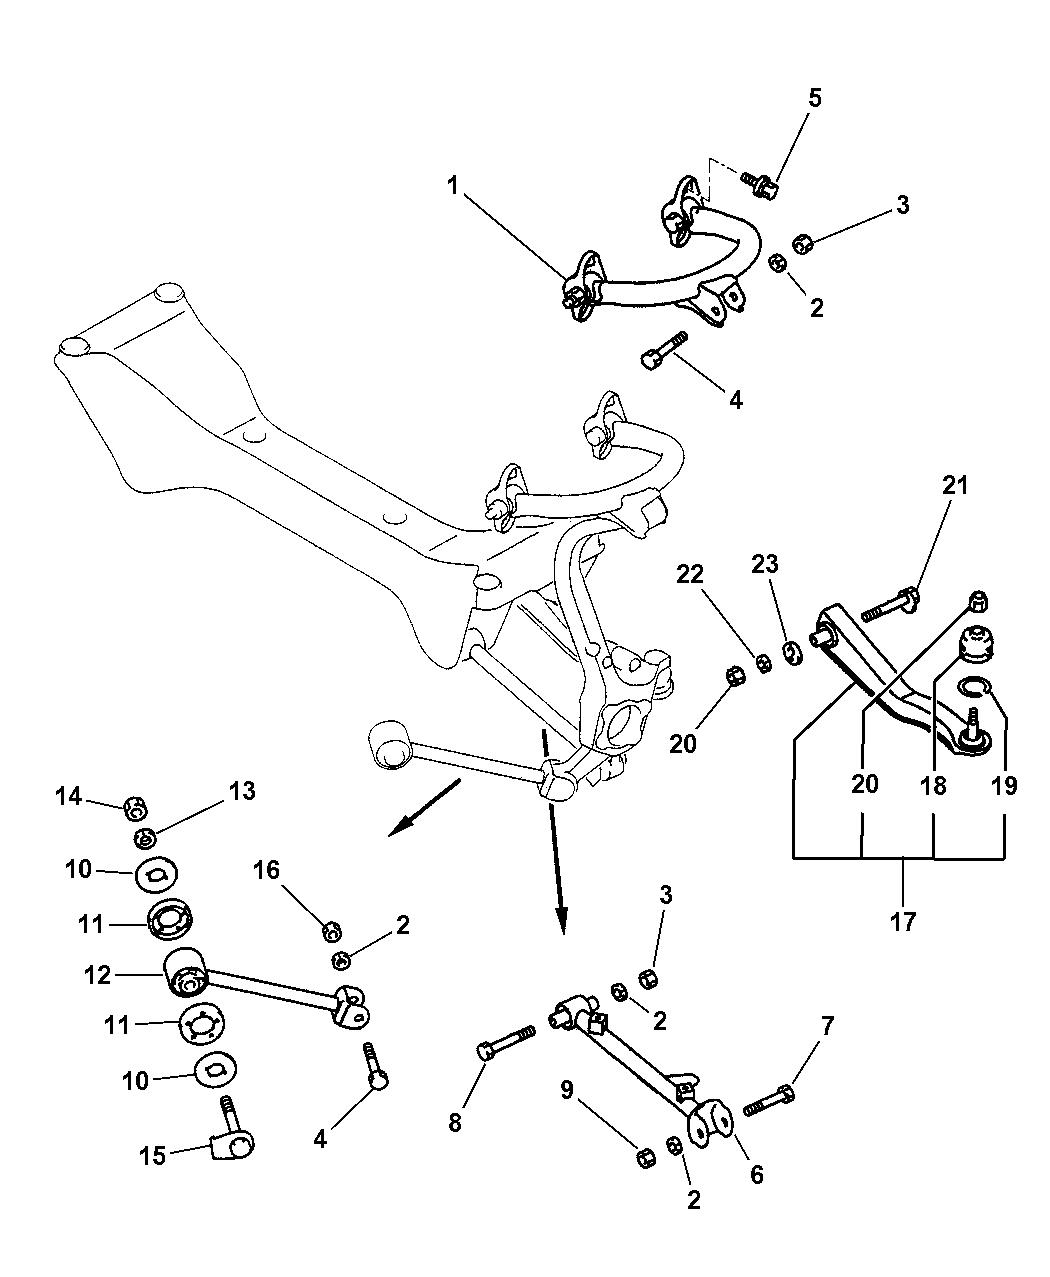 1995 Dodge Dakota Rear End Diagram